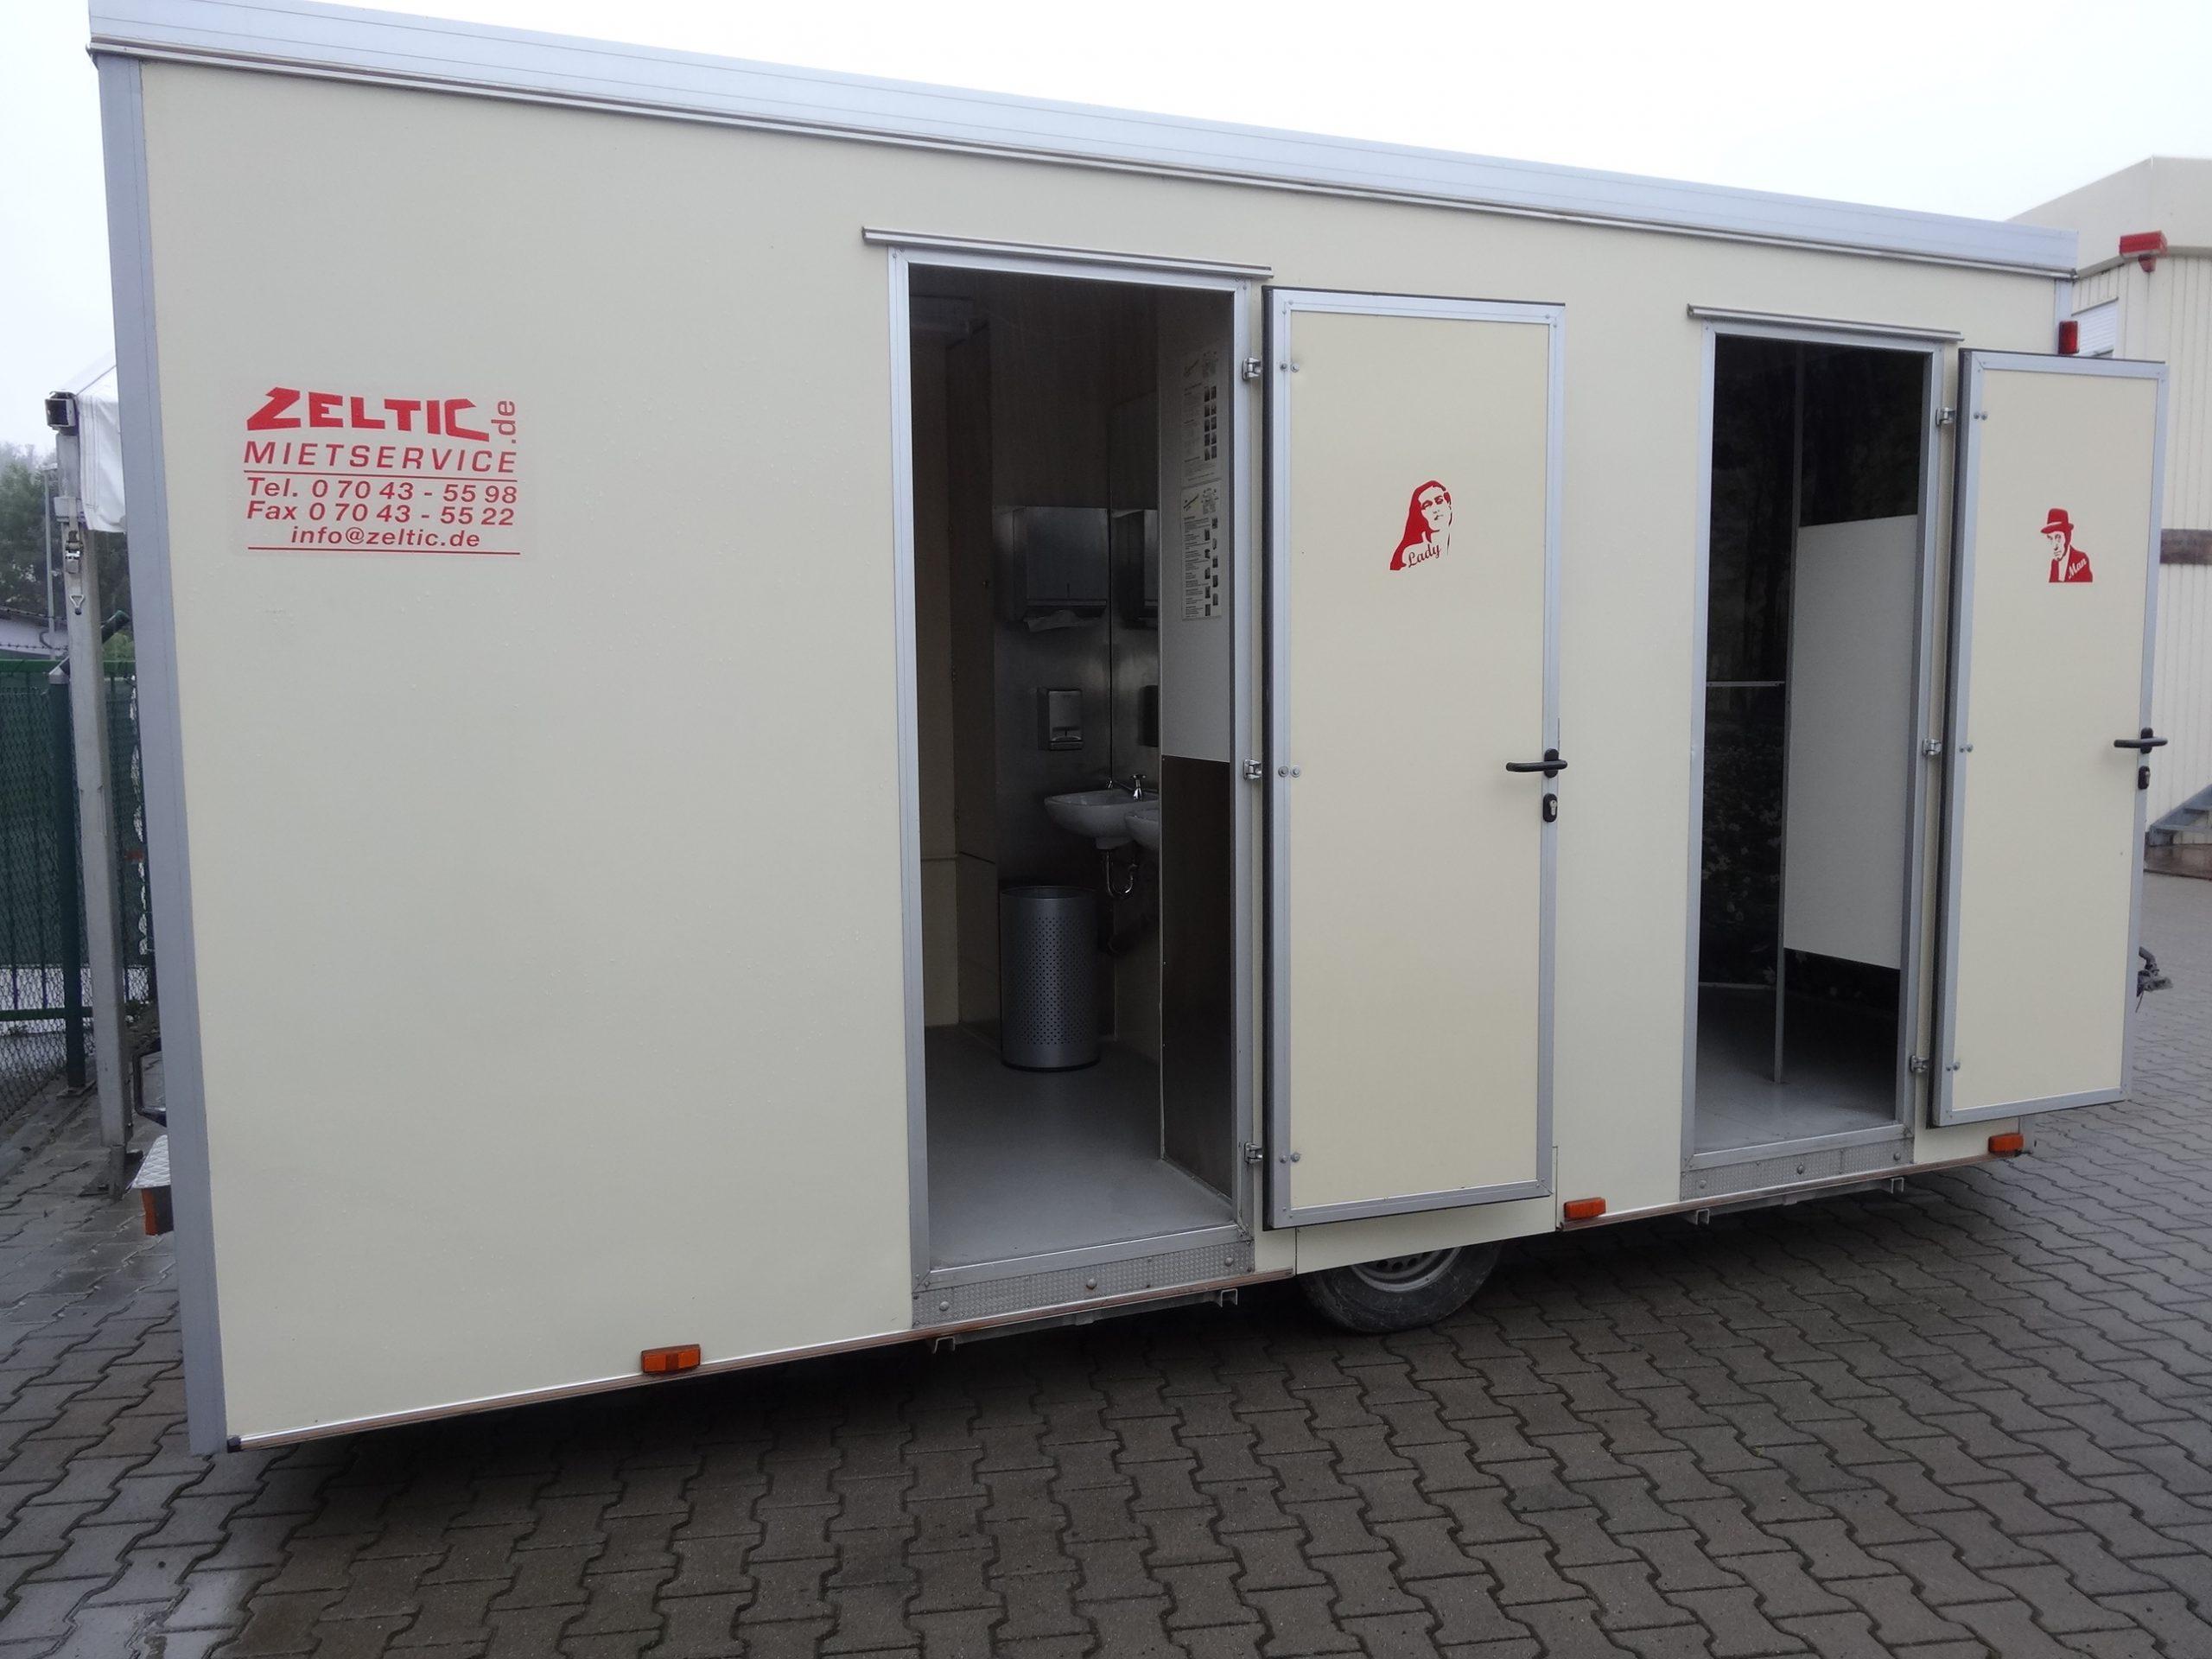 Toilettenwagen (absenkbar)